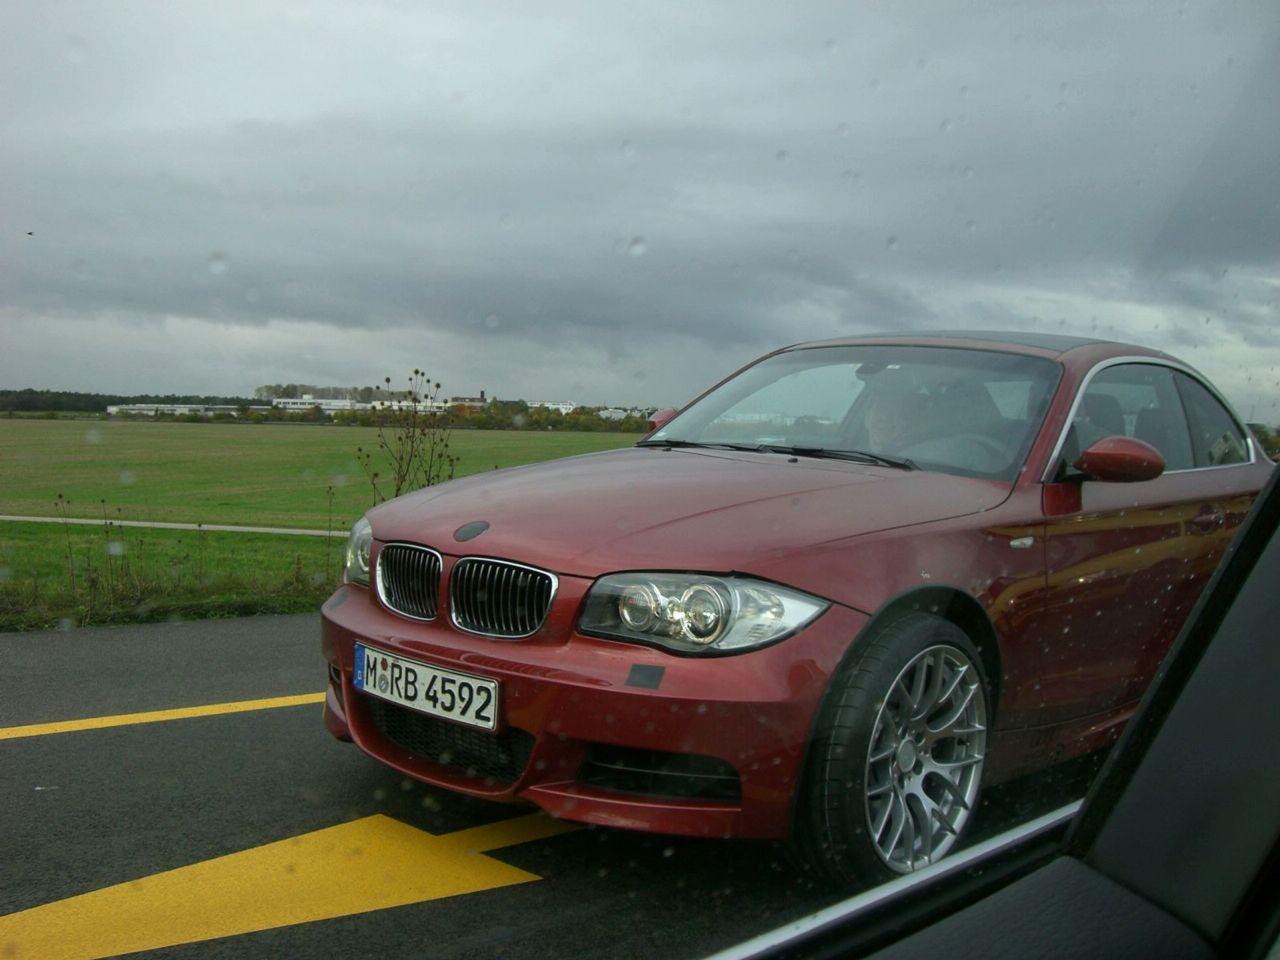 Spy Photos: BMW Series 1 Coupe M